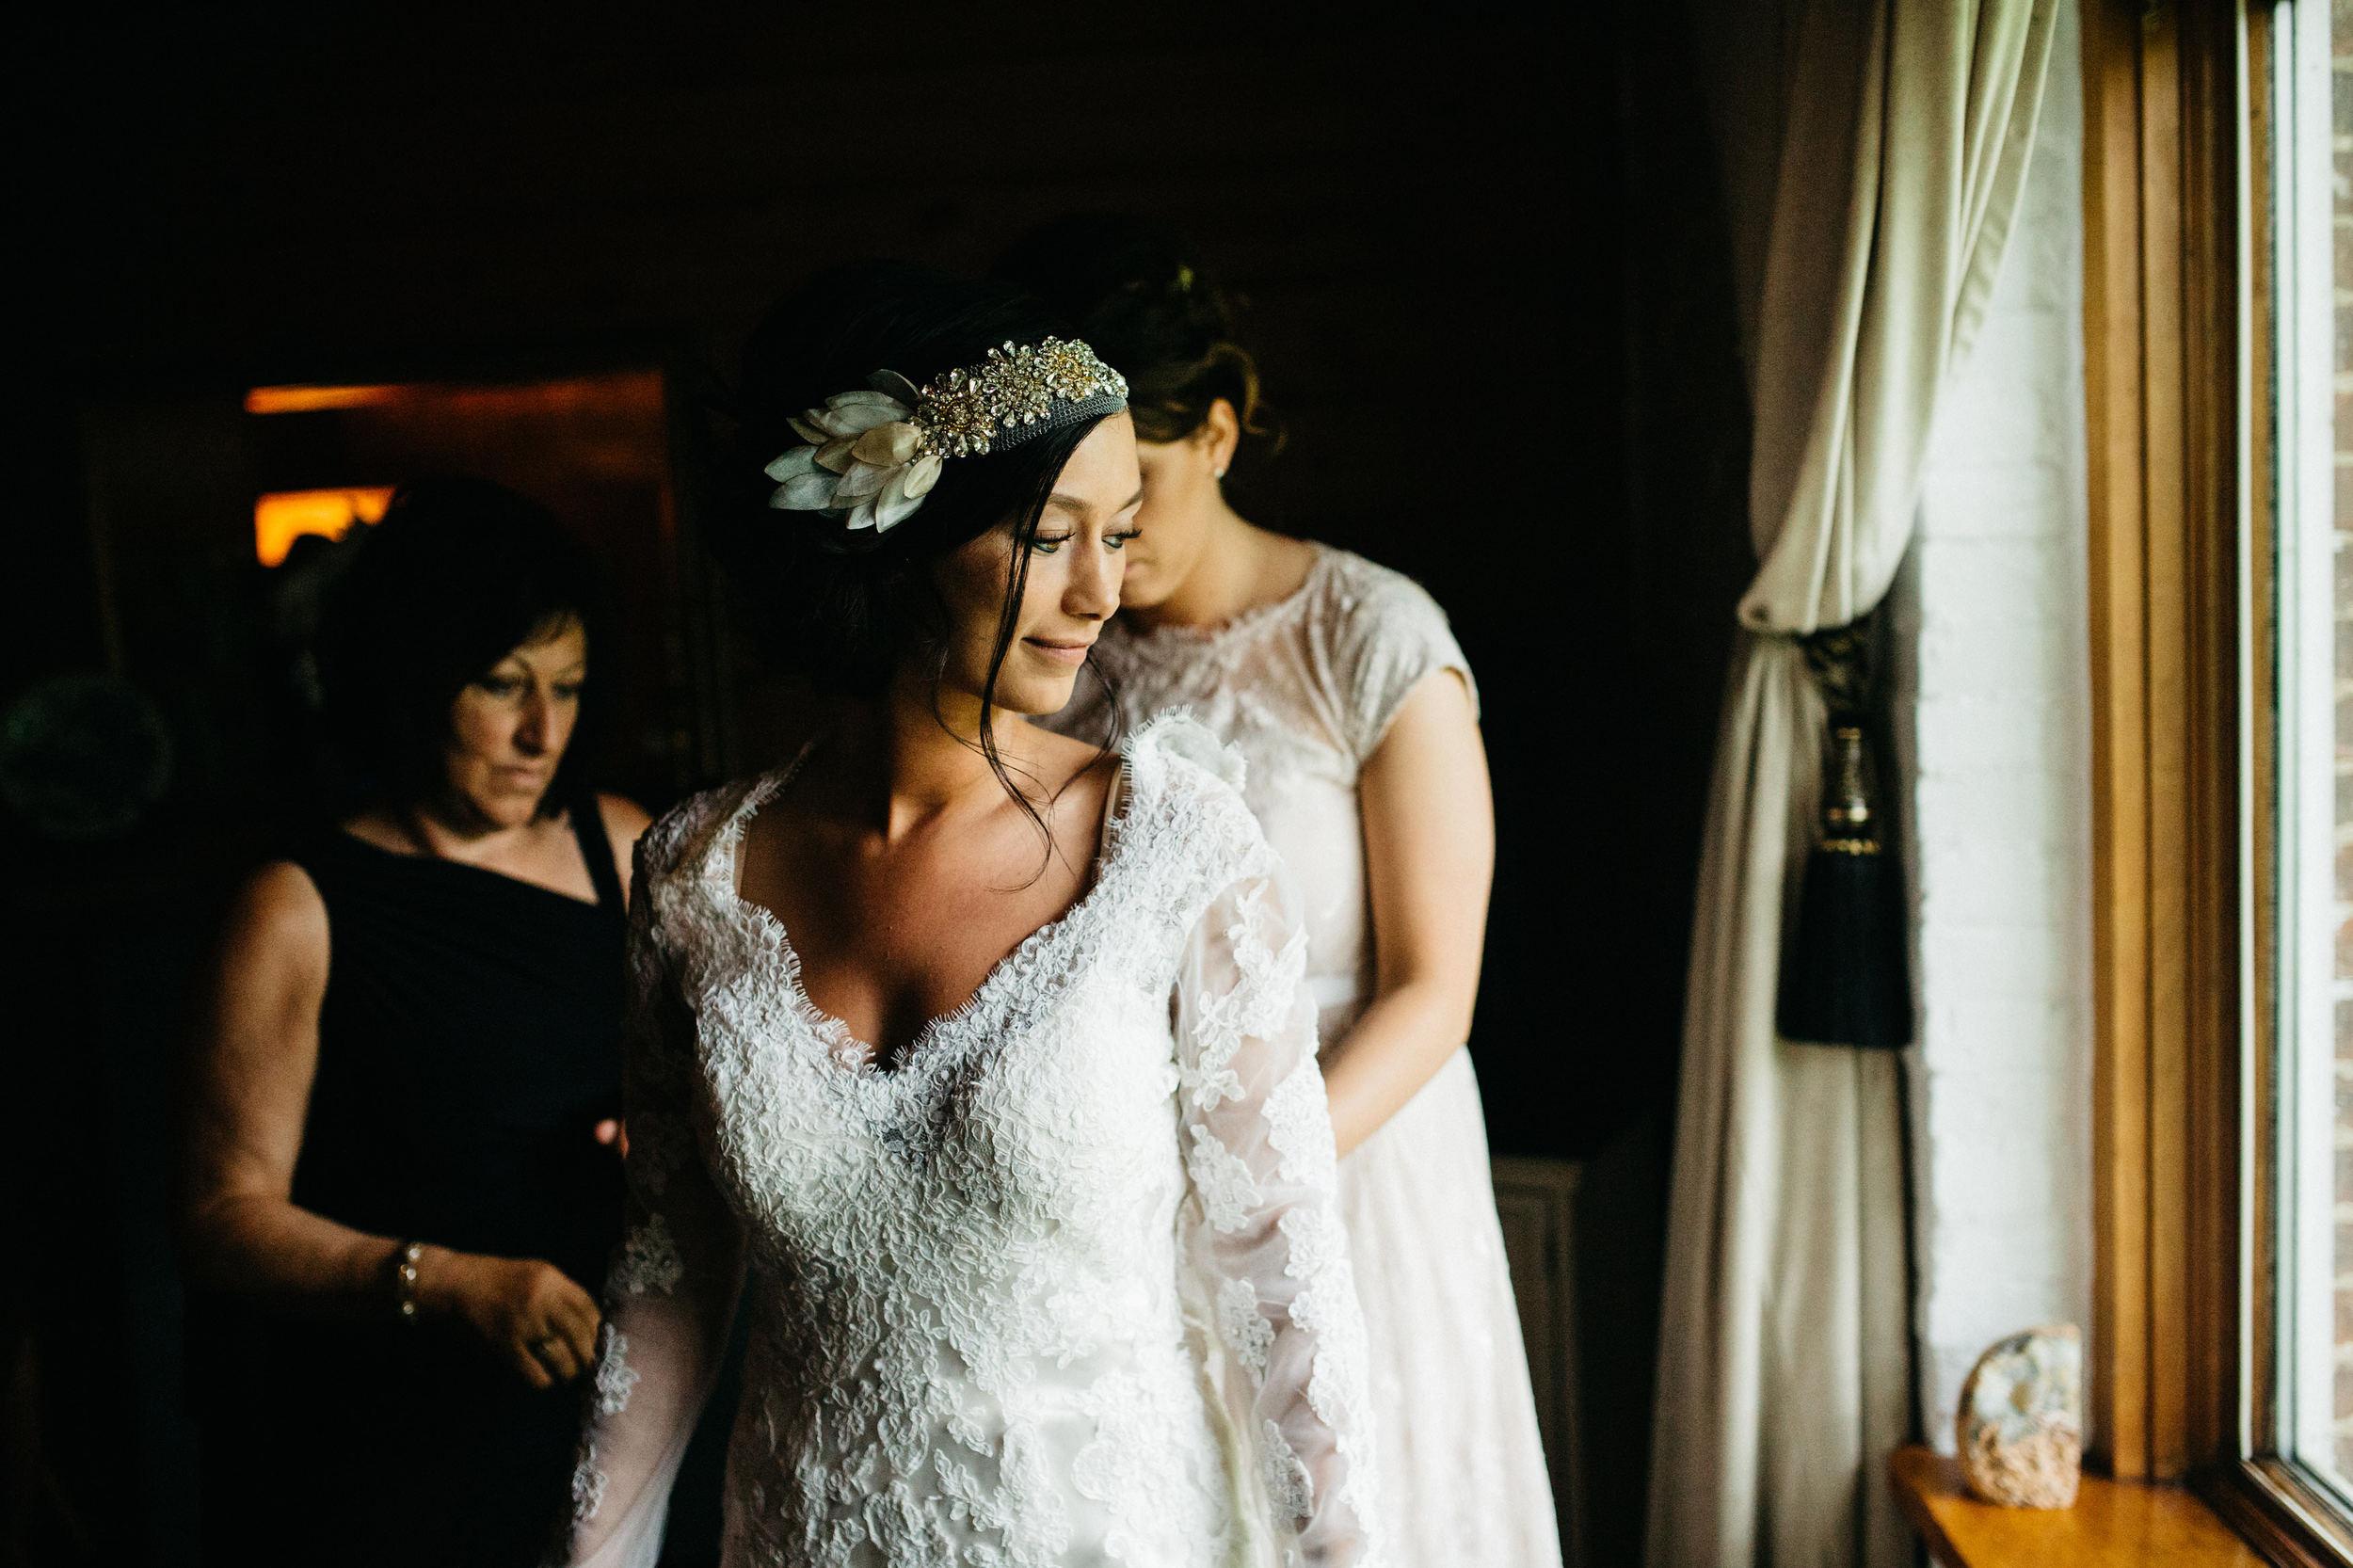 Lace Wedding Dress in Ohio Wedding